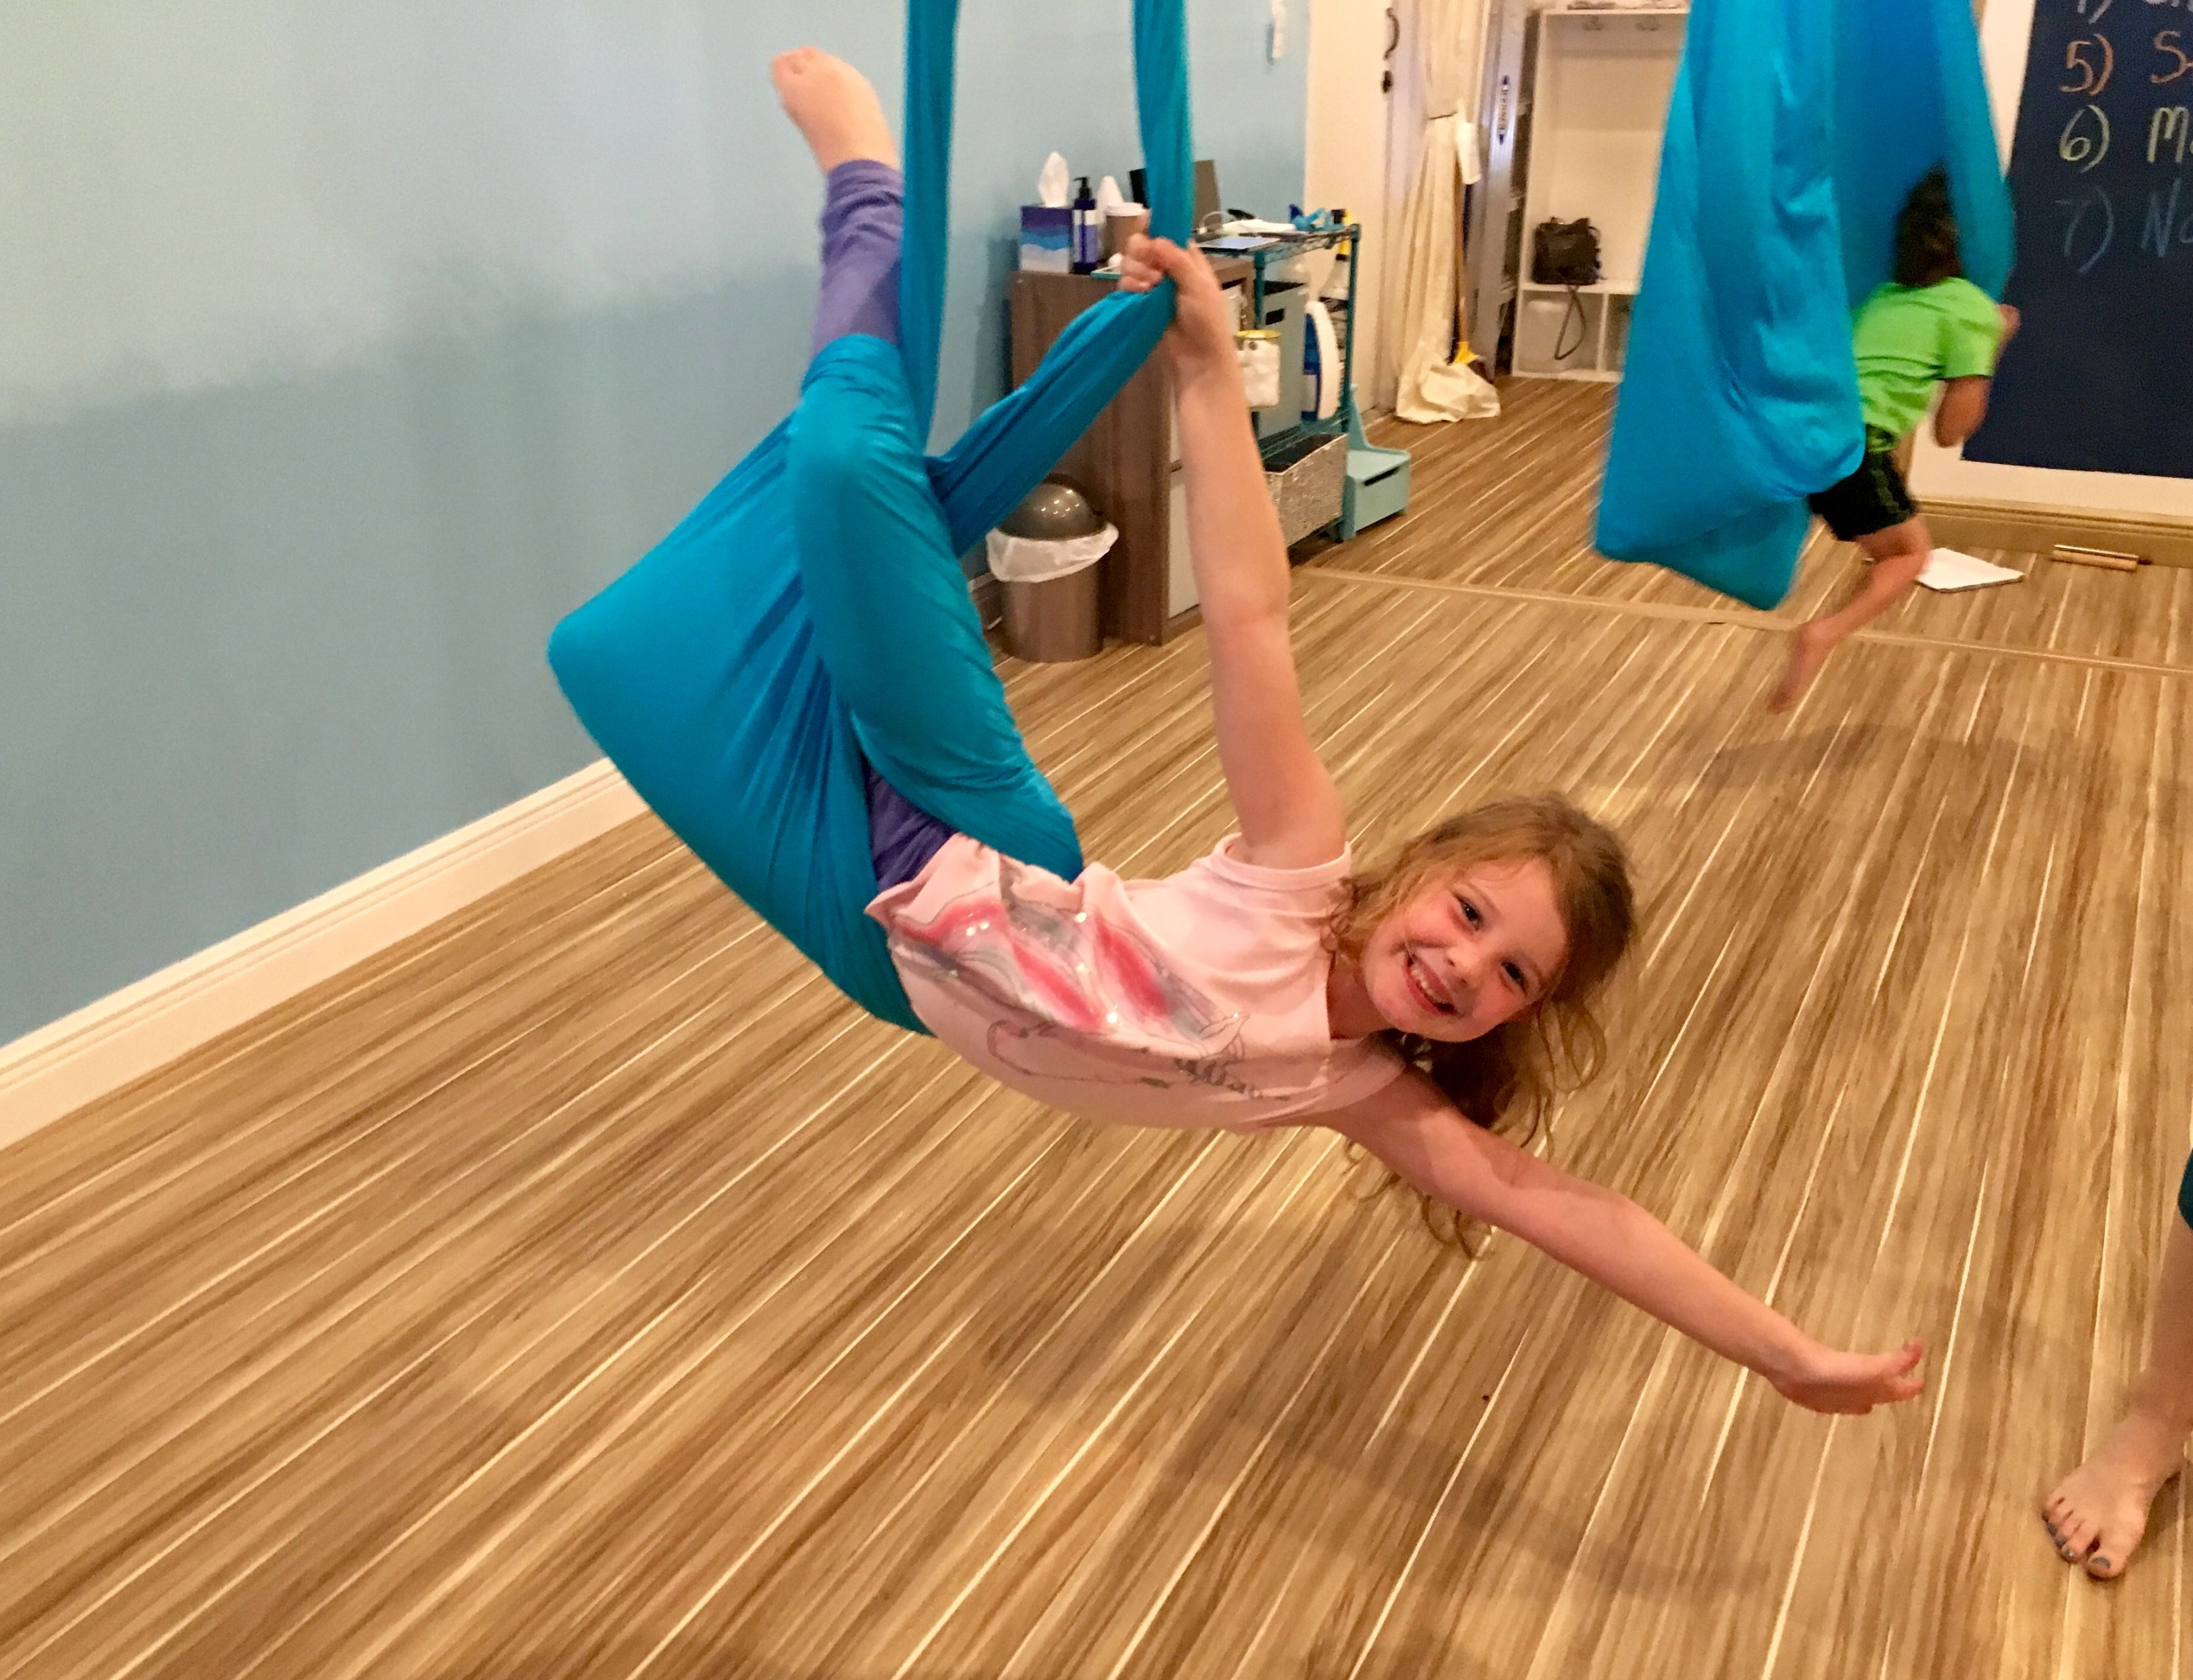 Aerial yoga hammock for kids Sensory Swing functional furniture